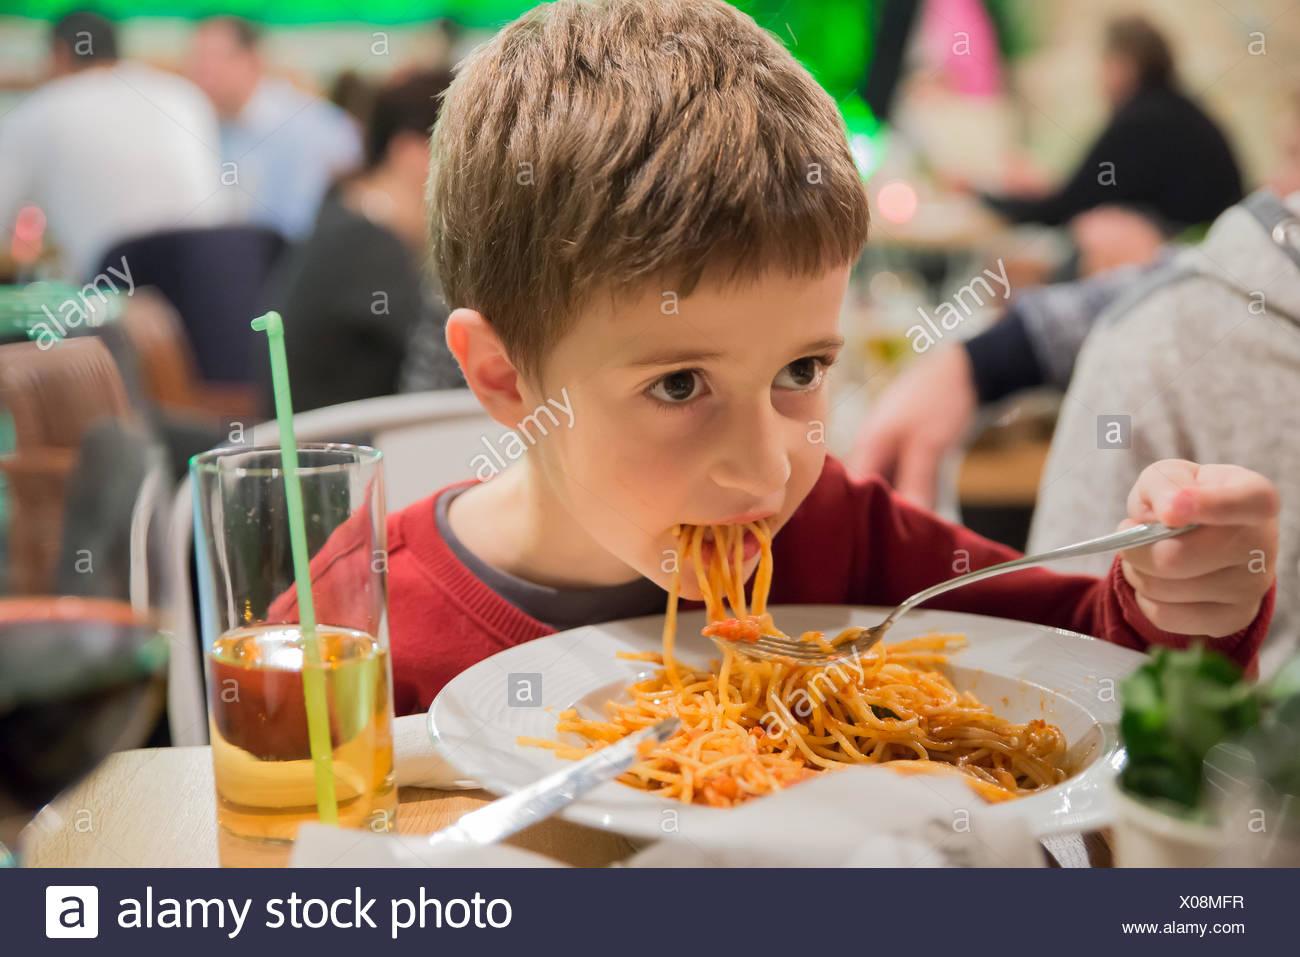 Garçon assis dans un restaurant mange du spaghetti Photo Stock